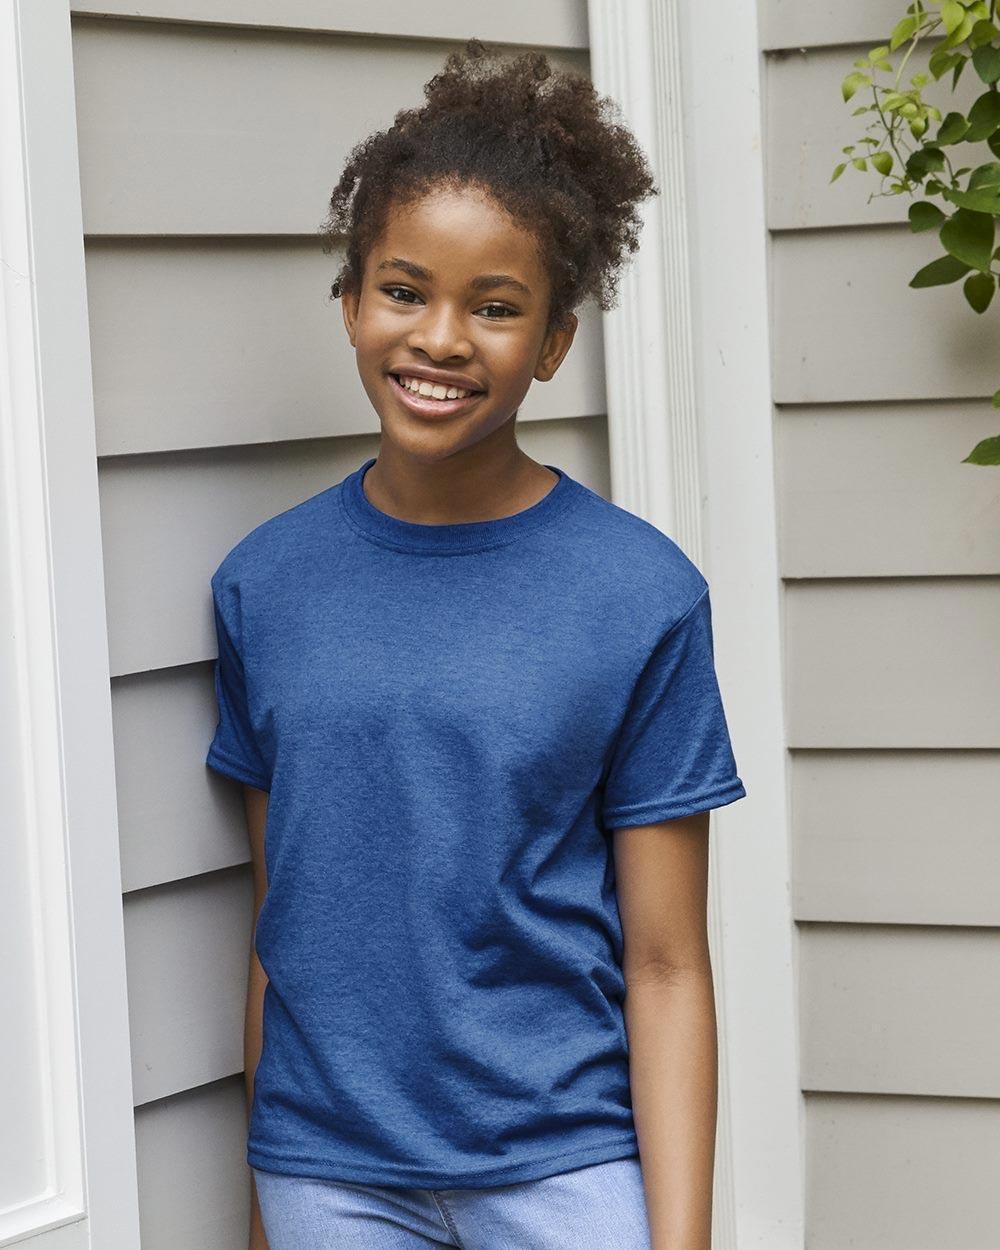 Gildan 8000B - DryBlend Youth T-Shirt